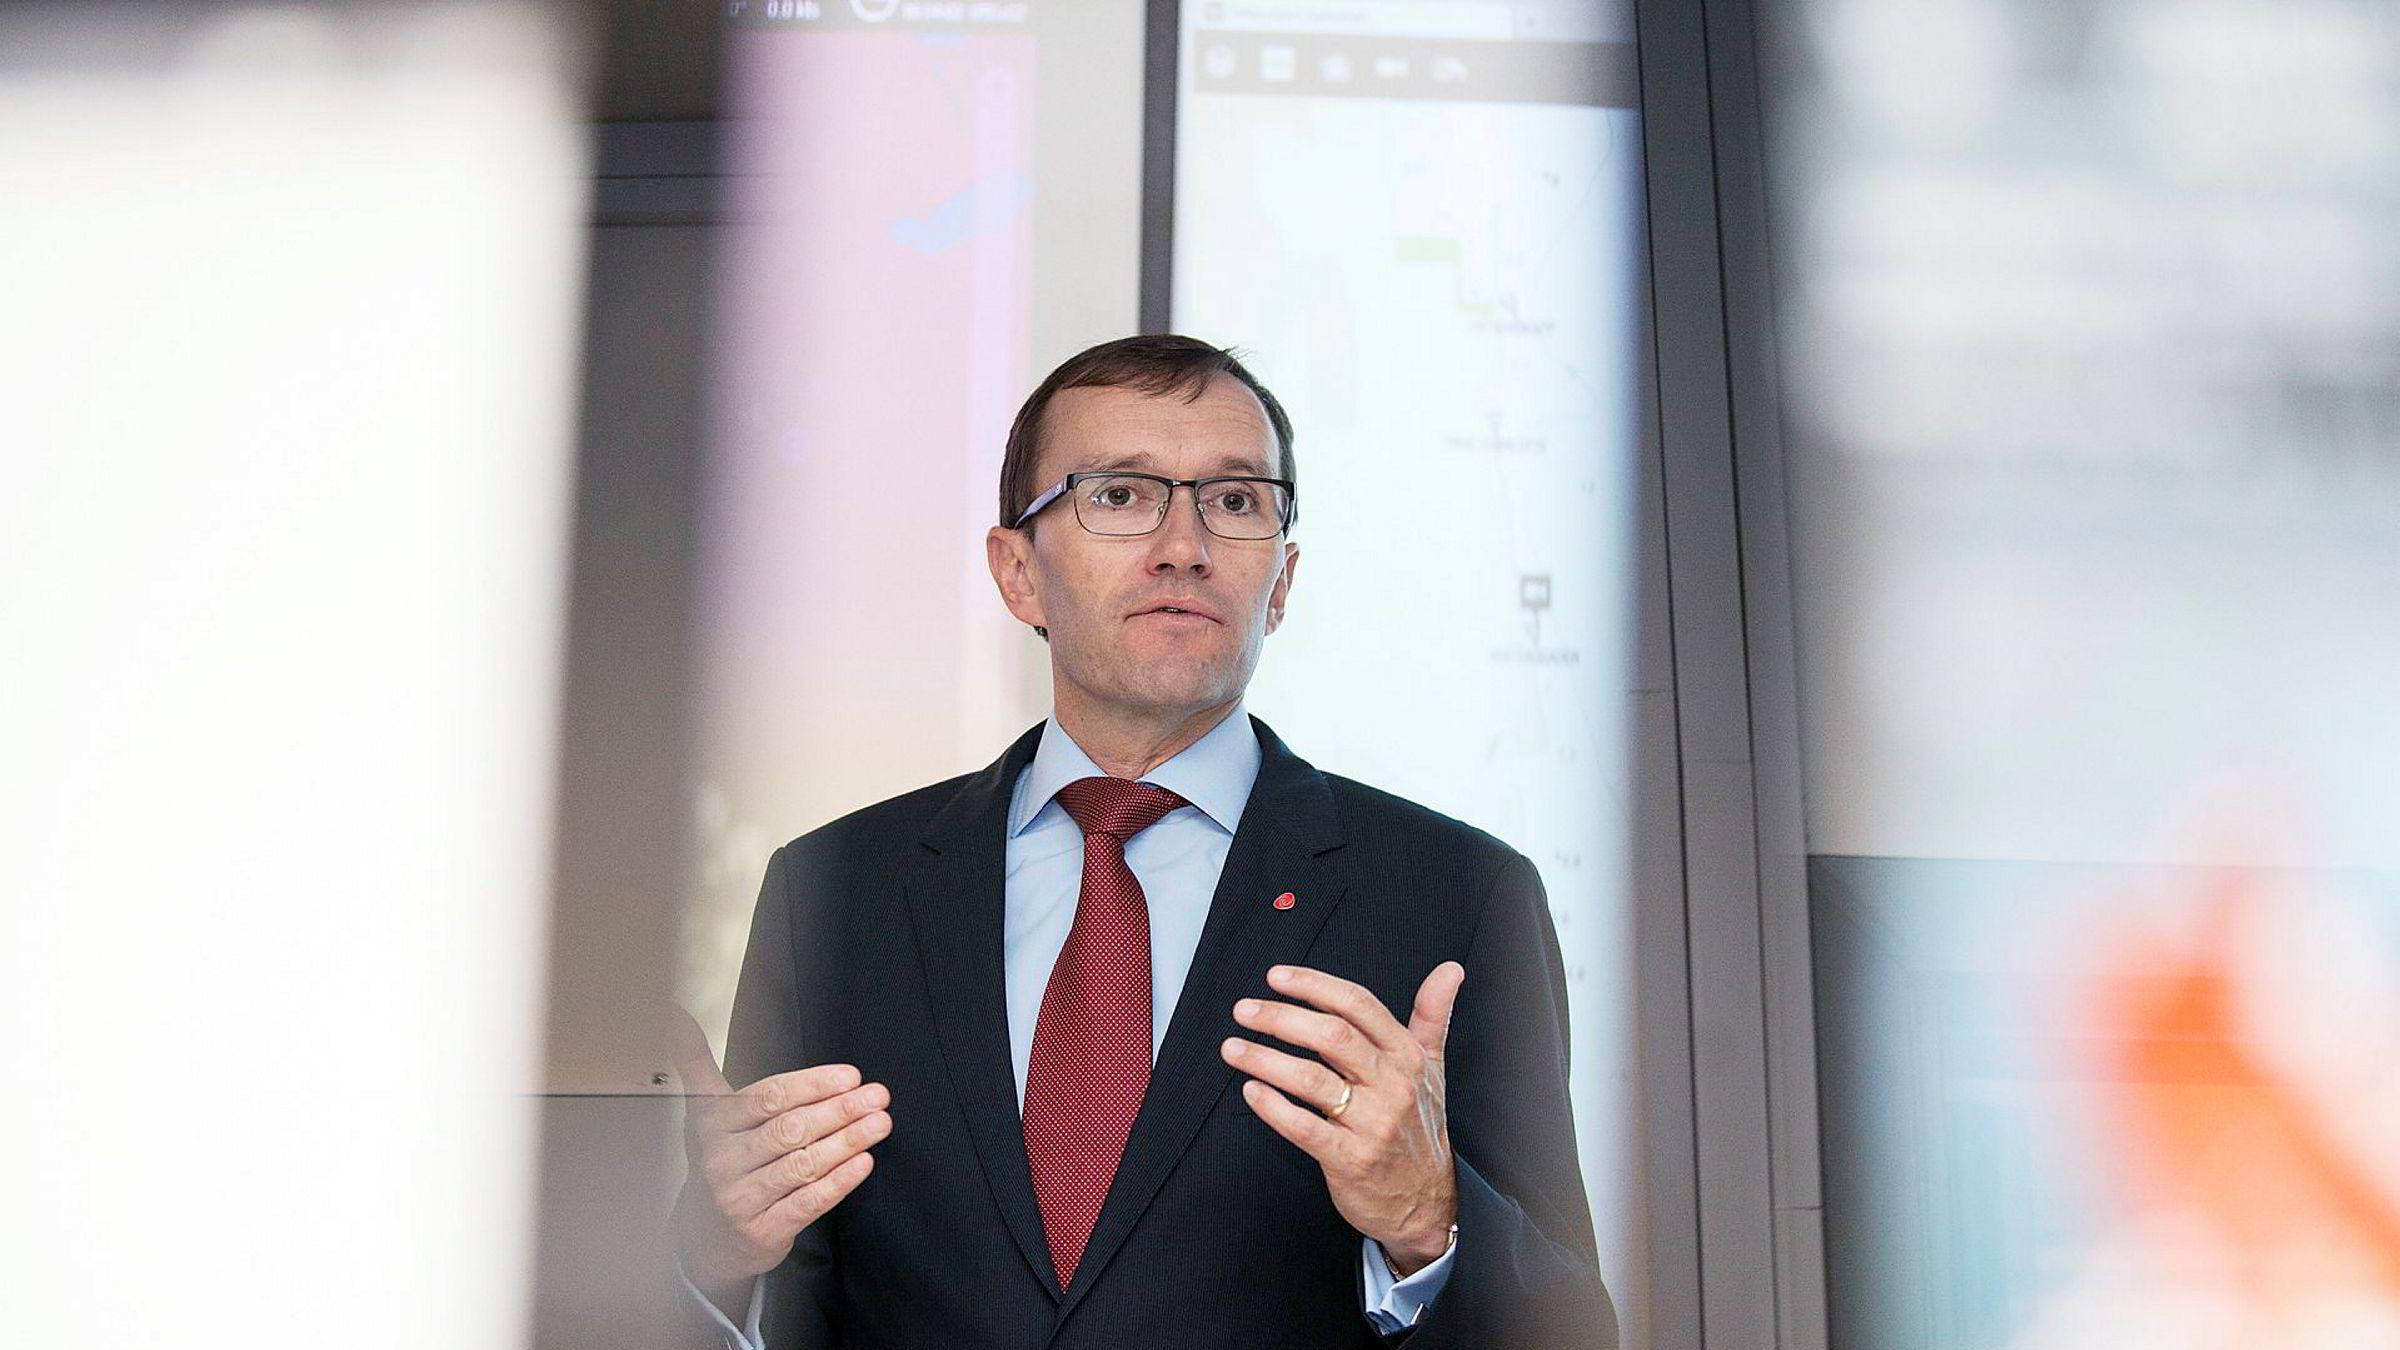 Espen Barth Eide ønsker at Statoils navneendring skal drøftes på Stortinget før den vedtas.